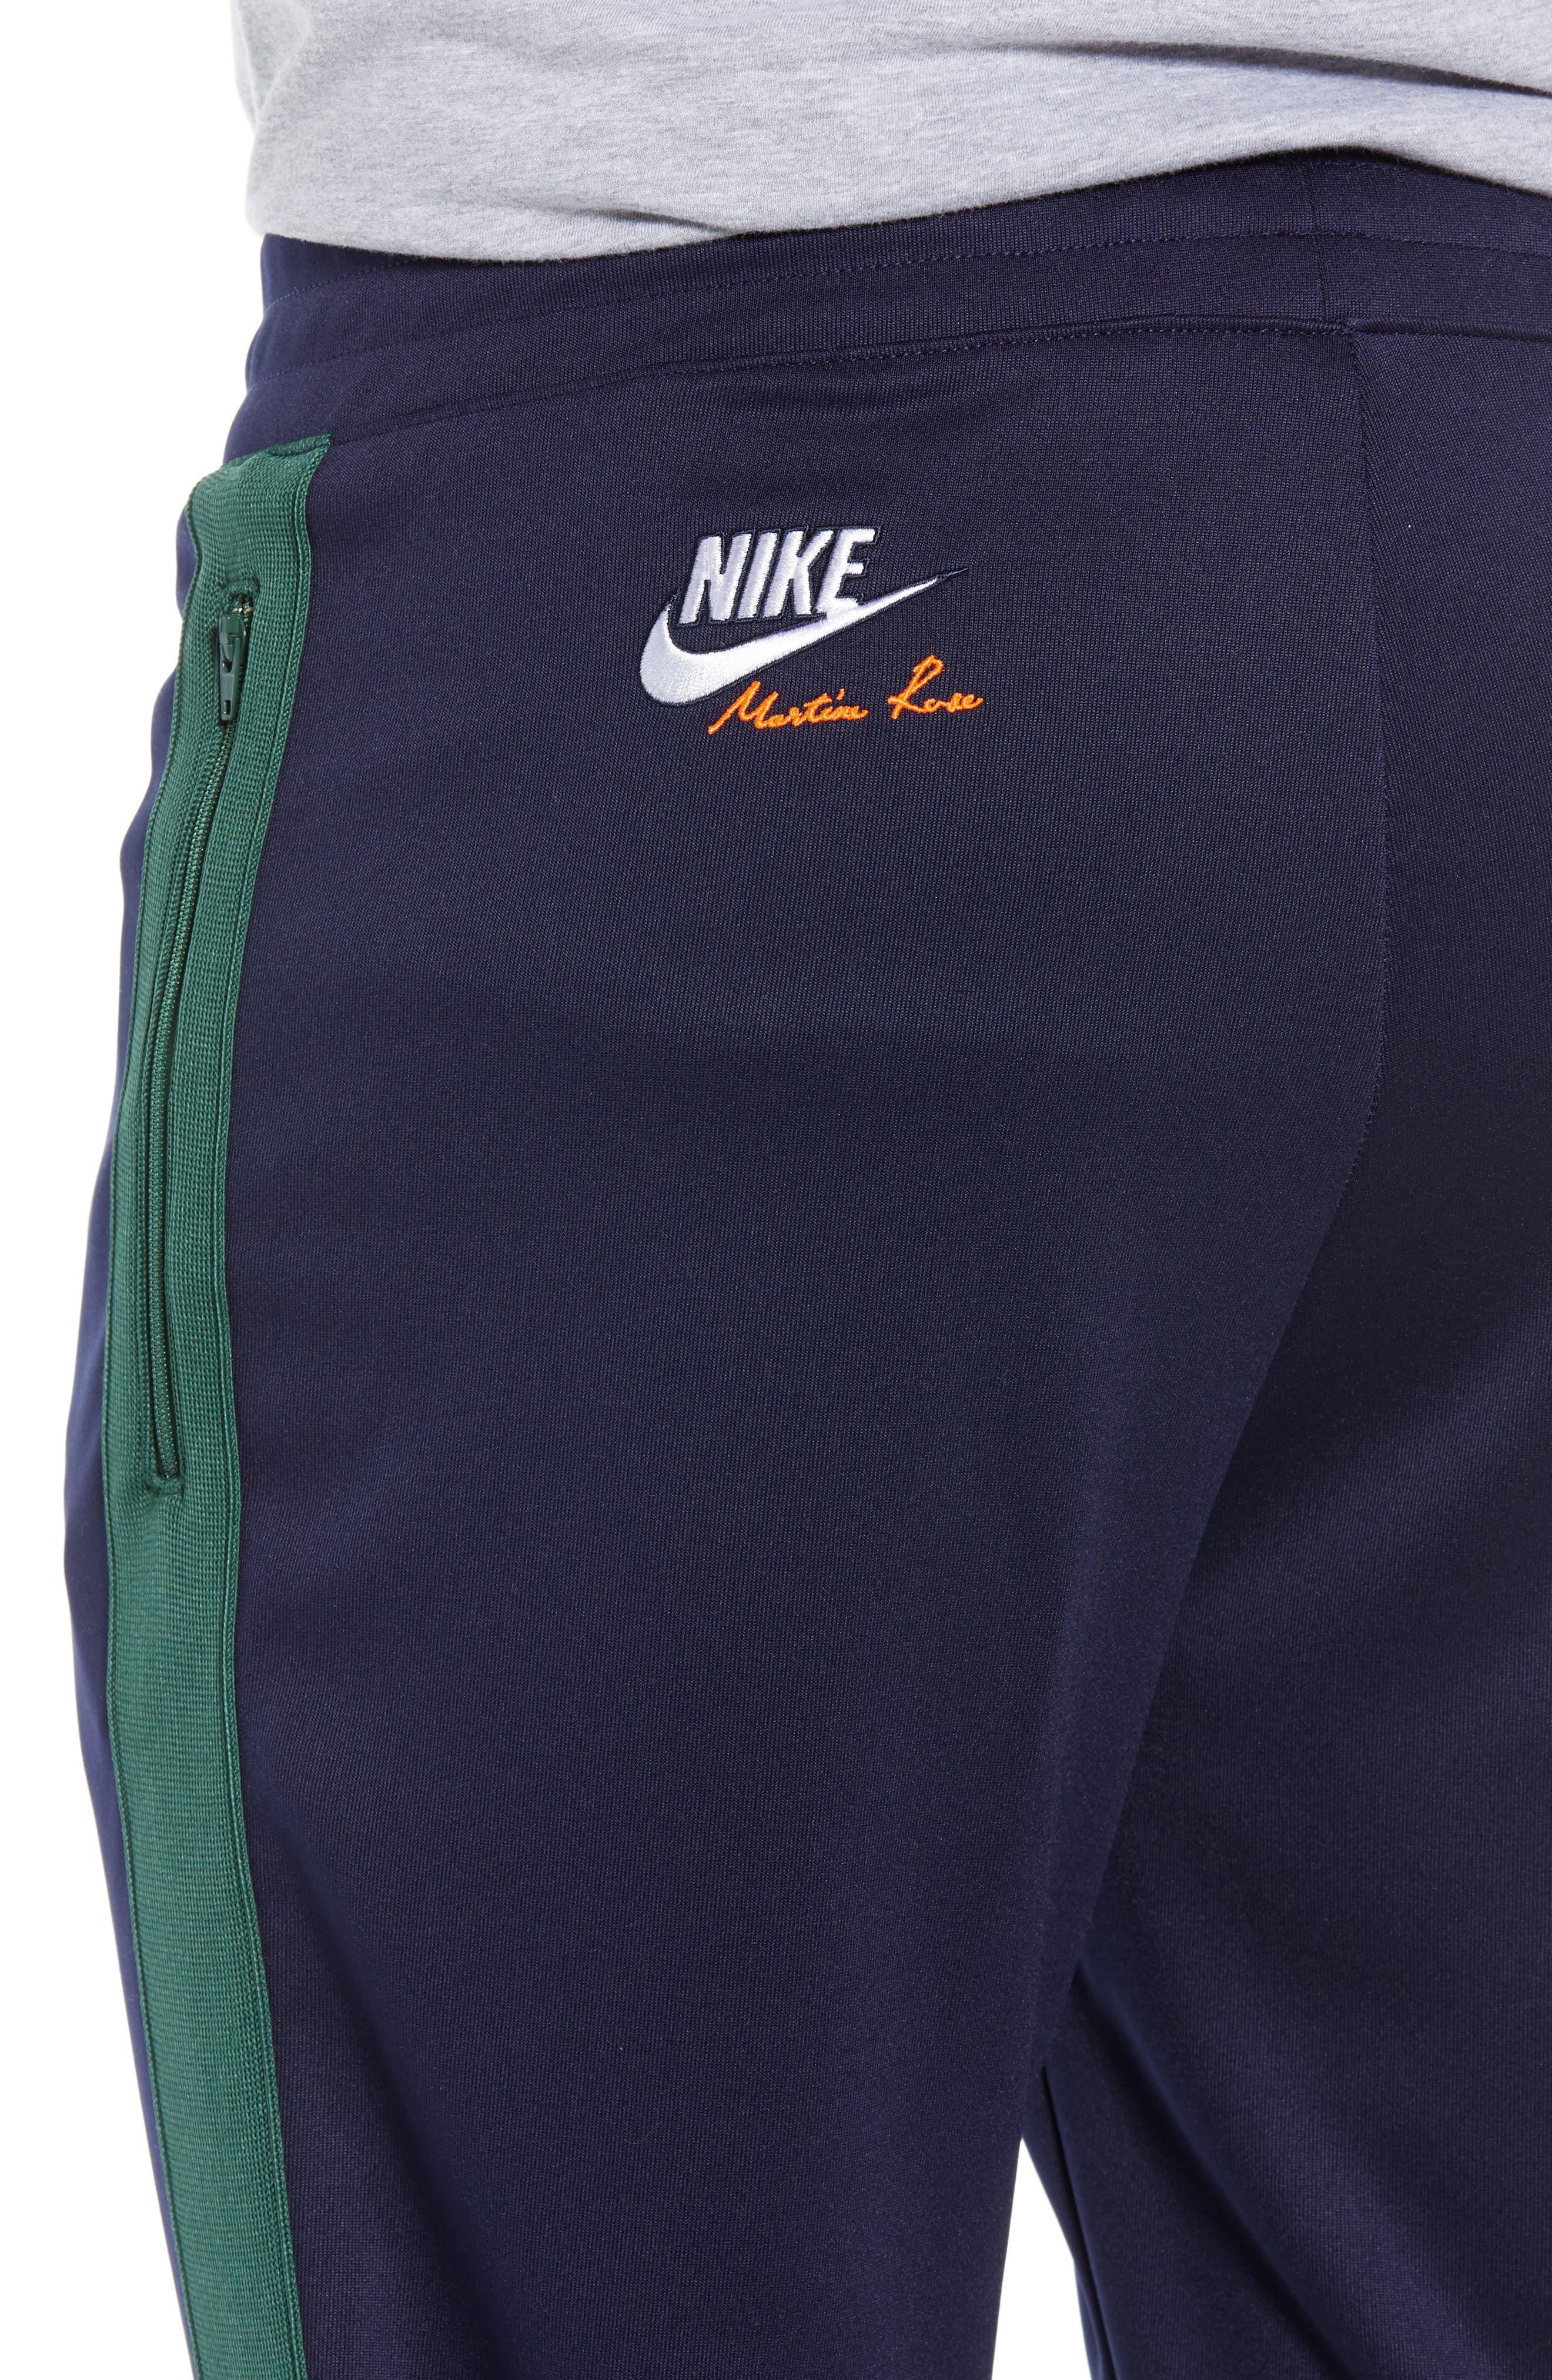 NIKE,                             x Martine Rose Men's Track Pants,                             Alternate thumbnail 4, color,                             BLACKENED BLUE/ FIR